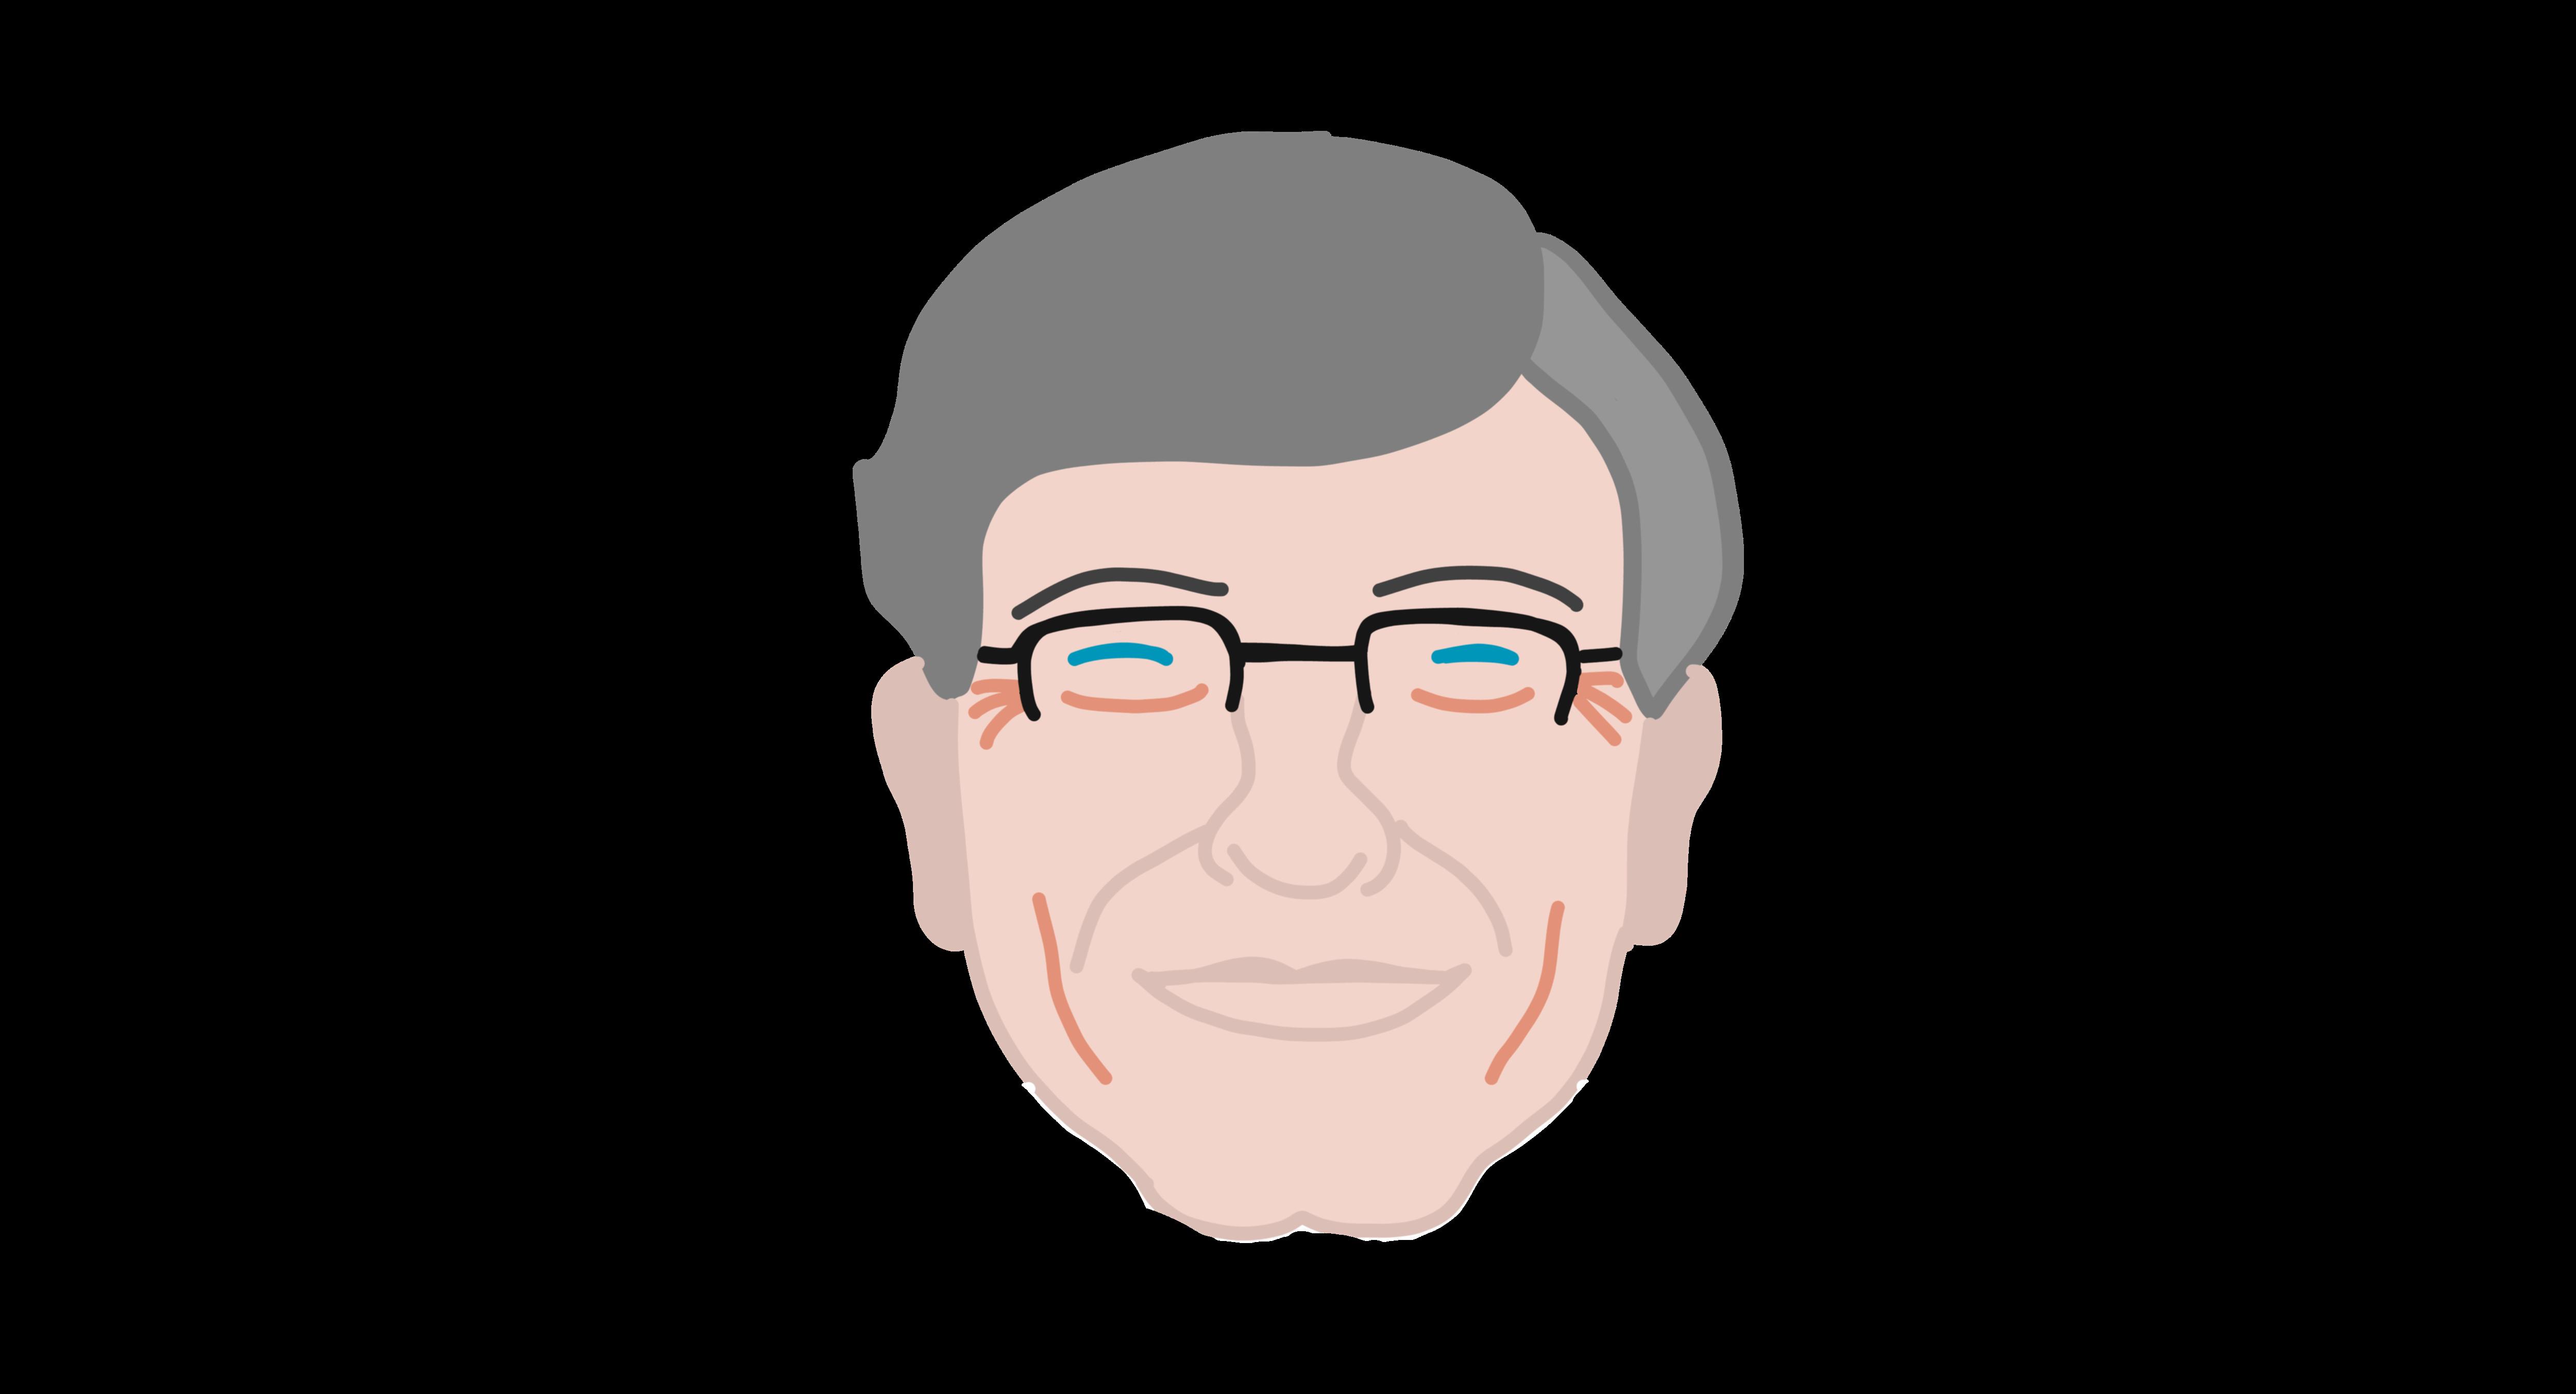 Bill Gates Portfolio Includes Several High Dividend Stocks We Reviewed Each Of Bill Gates Stocks That Pay Dividends And Ident Dividend Dividend Stocks Bills